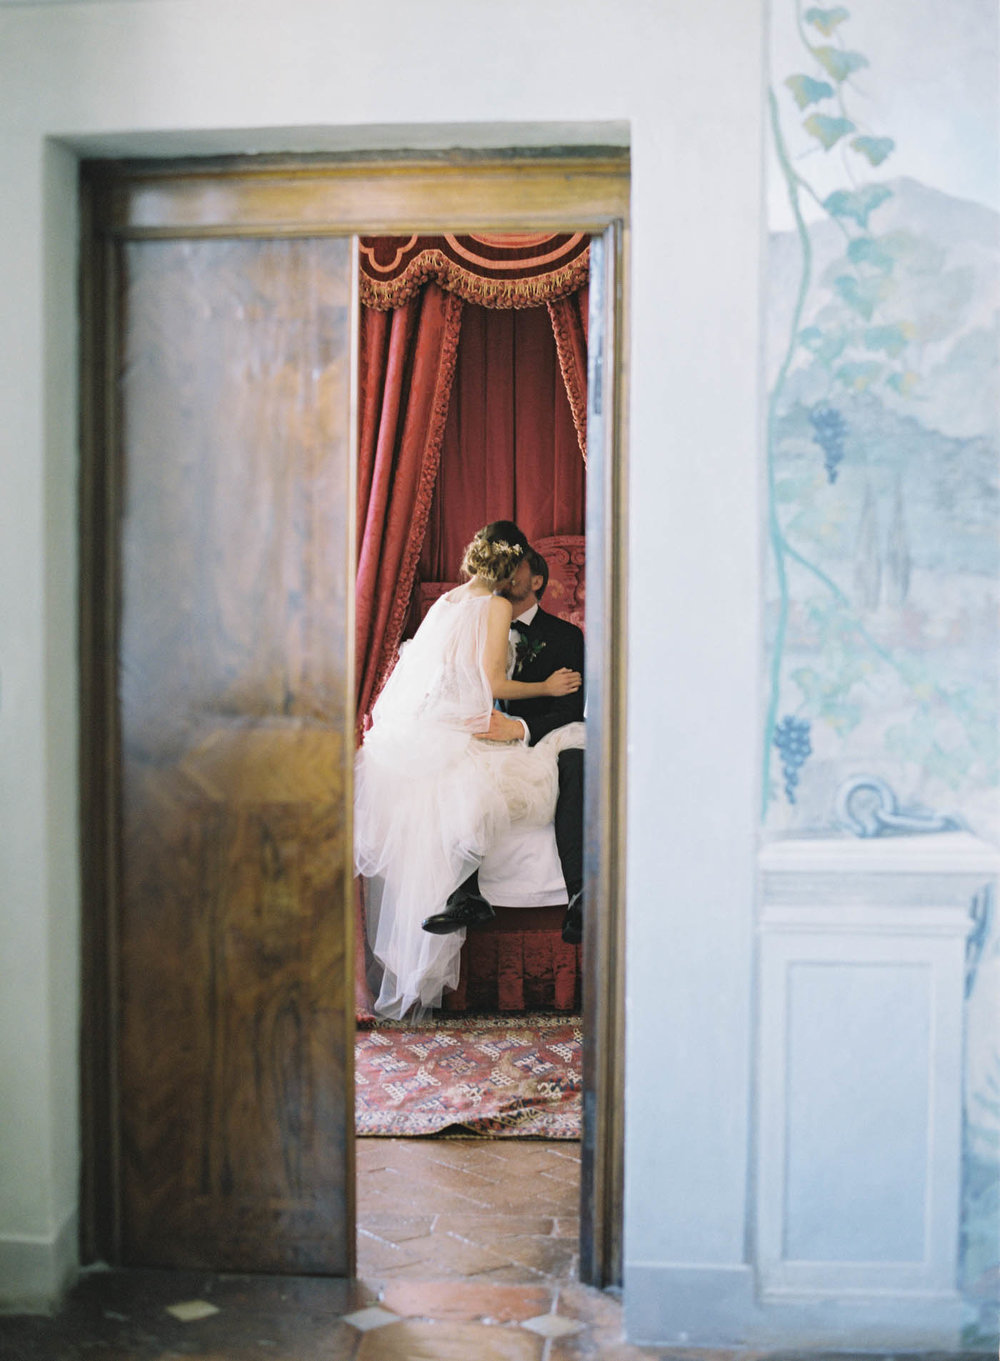 Villa_Cetinale_Wedding-23-Jen_Huang-ElanJacob-191-Jen_Huang-007308-R1-014.jpg